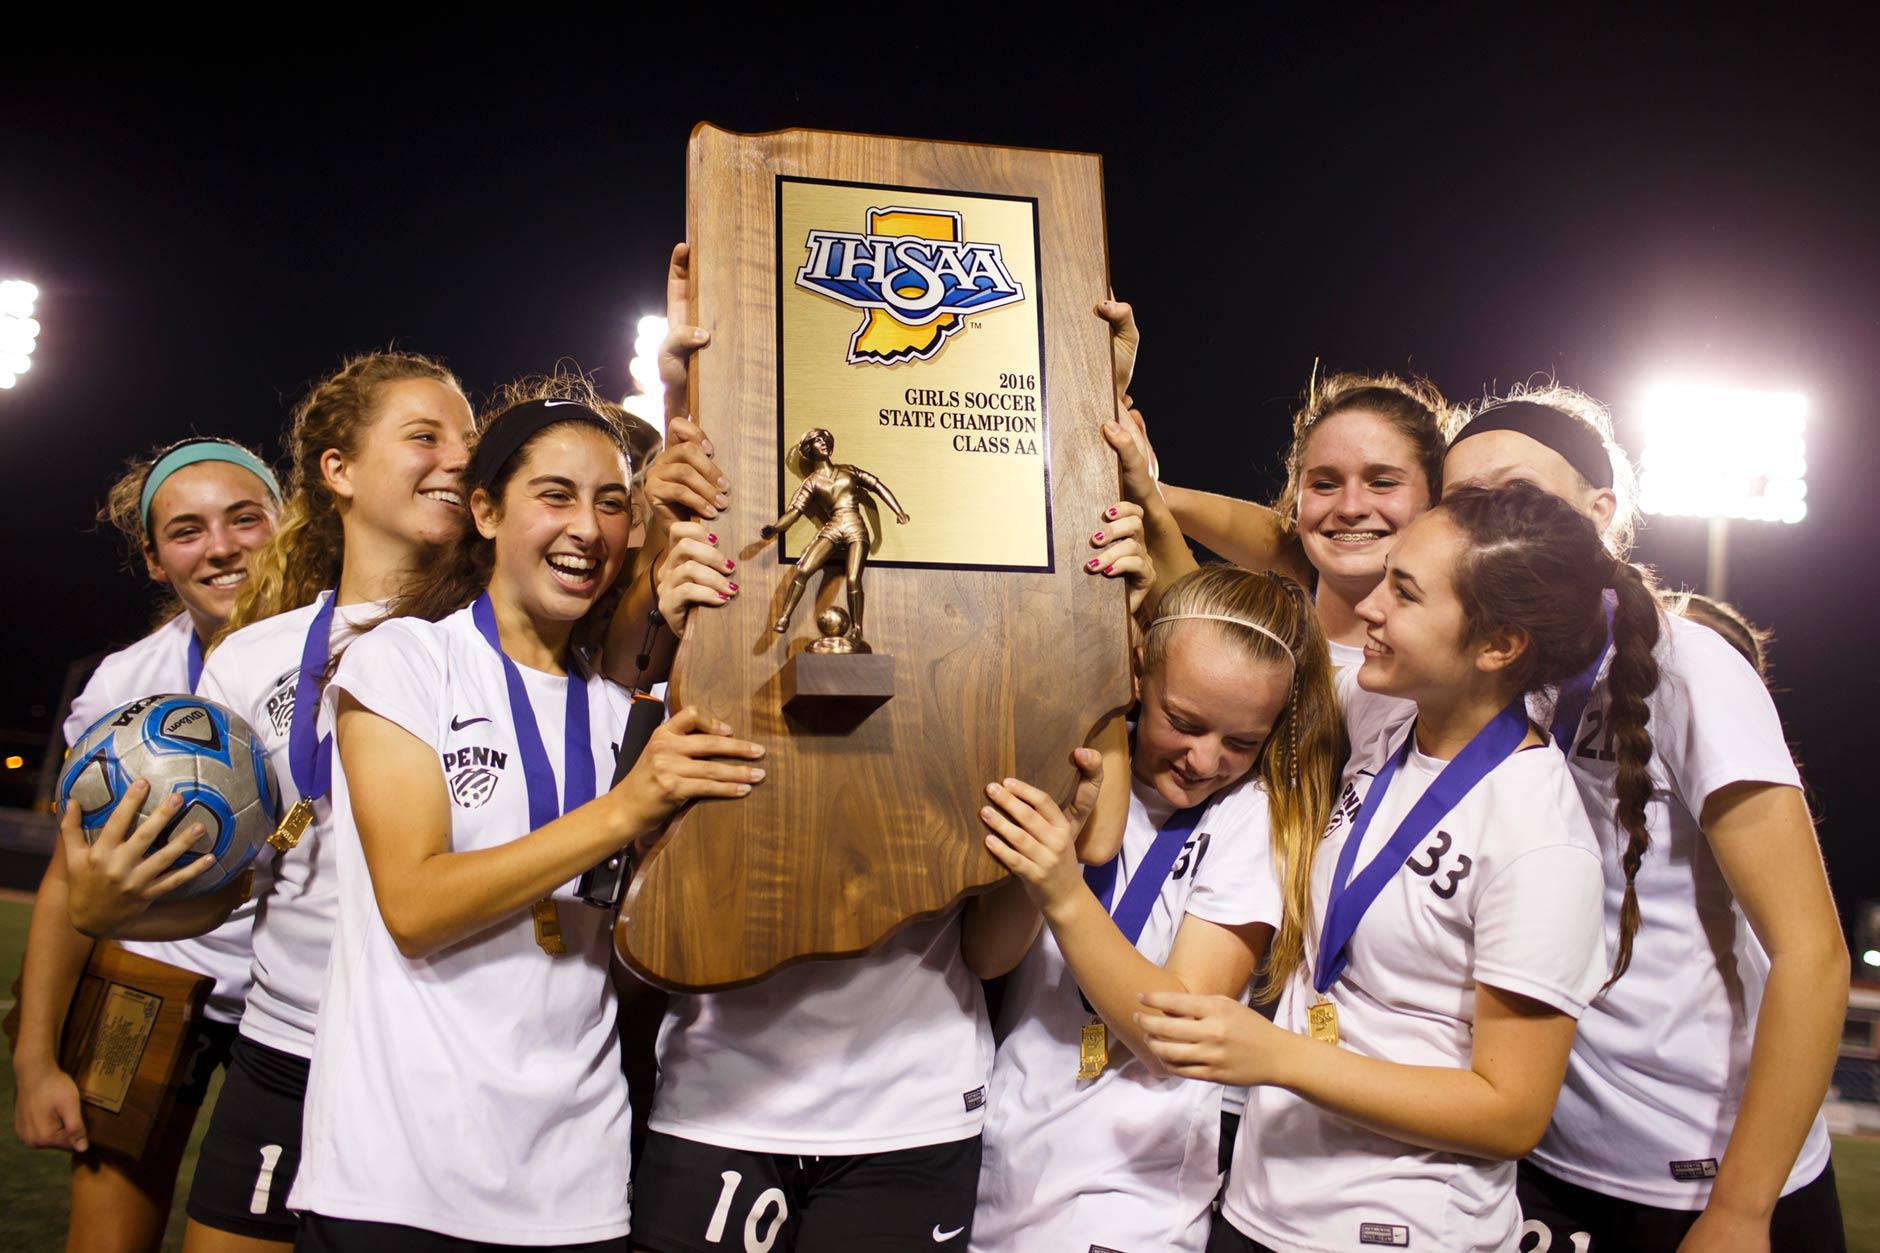 Penn Brebeuf Jesuit State Championship